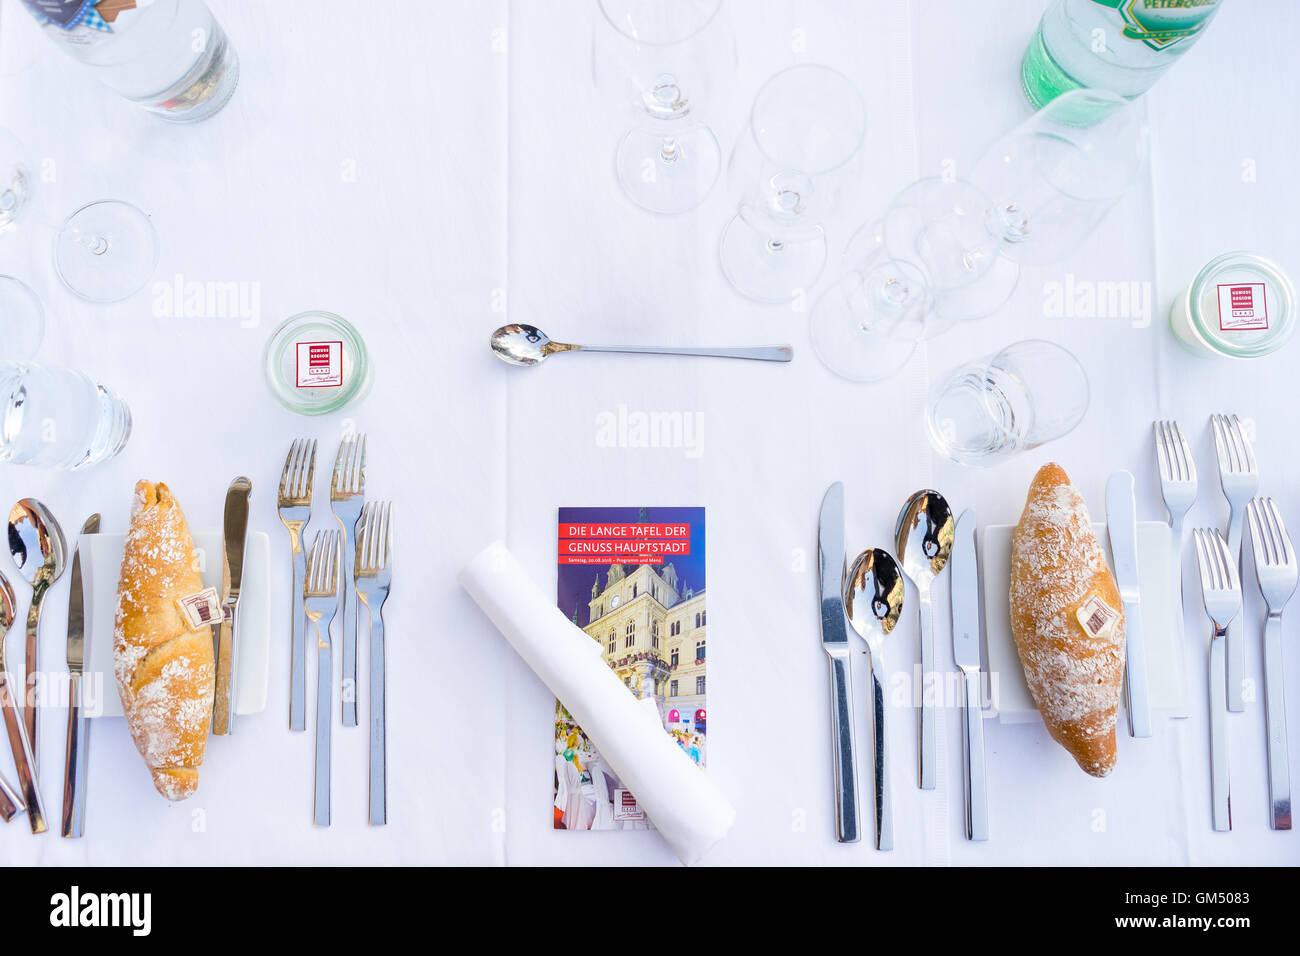 Tavola apparecchiata a lunga tavola - Lange Tafel der Genusshauptstadt Graz Immagini Stock